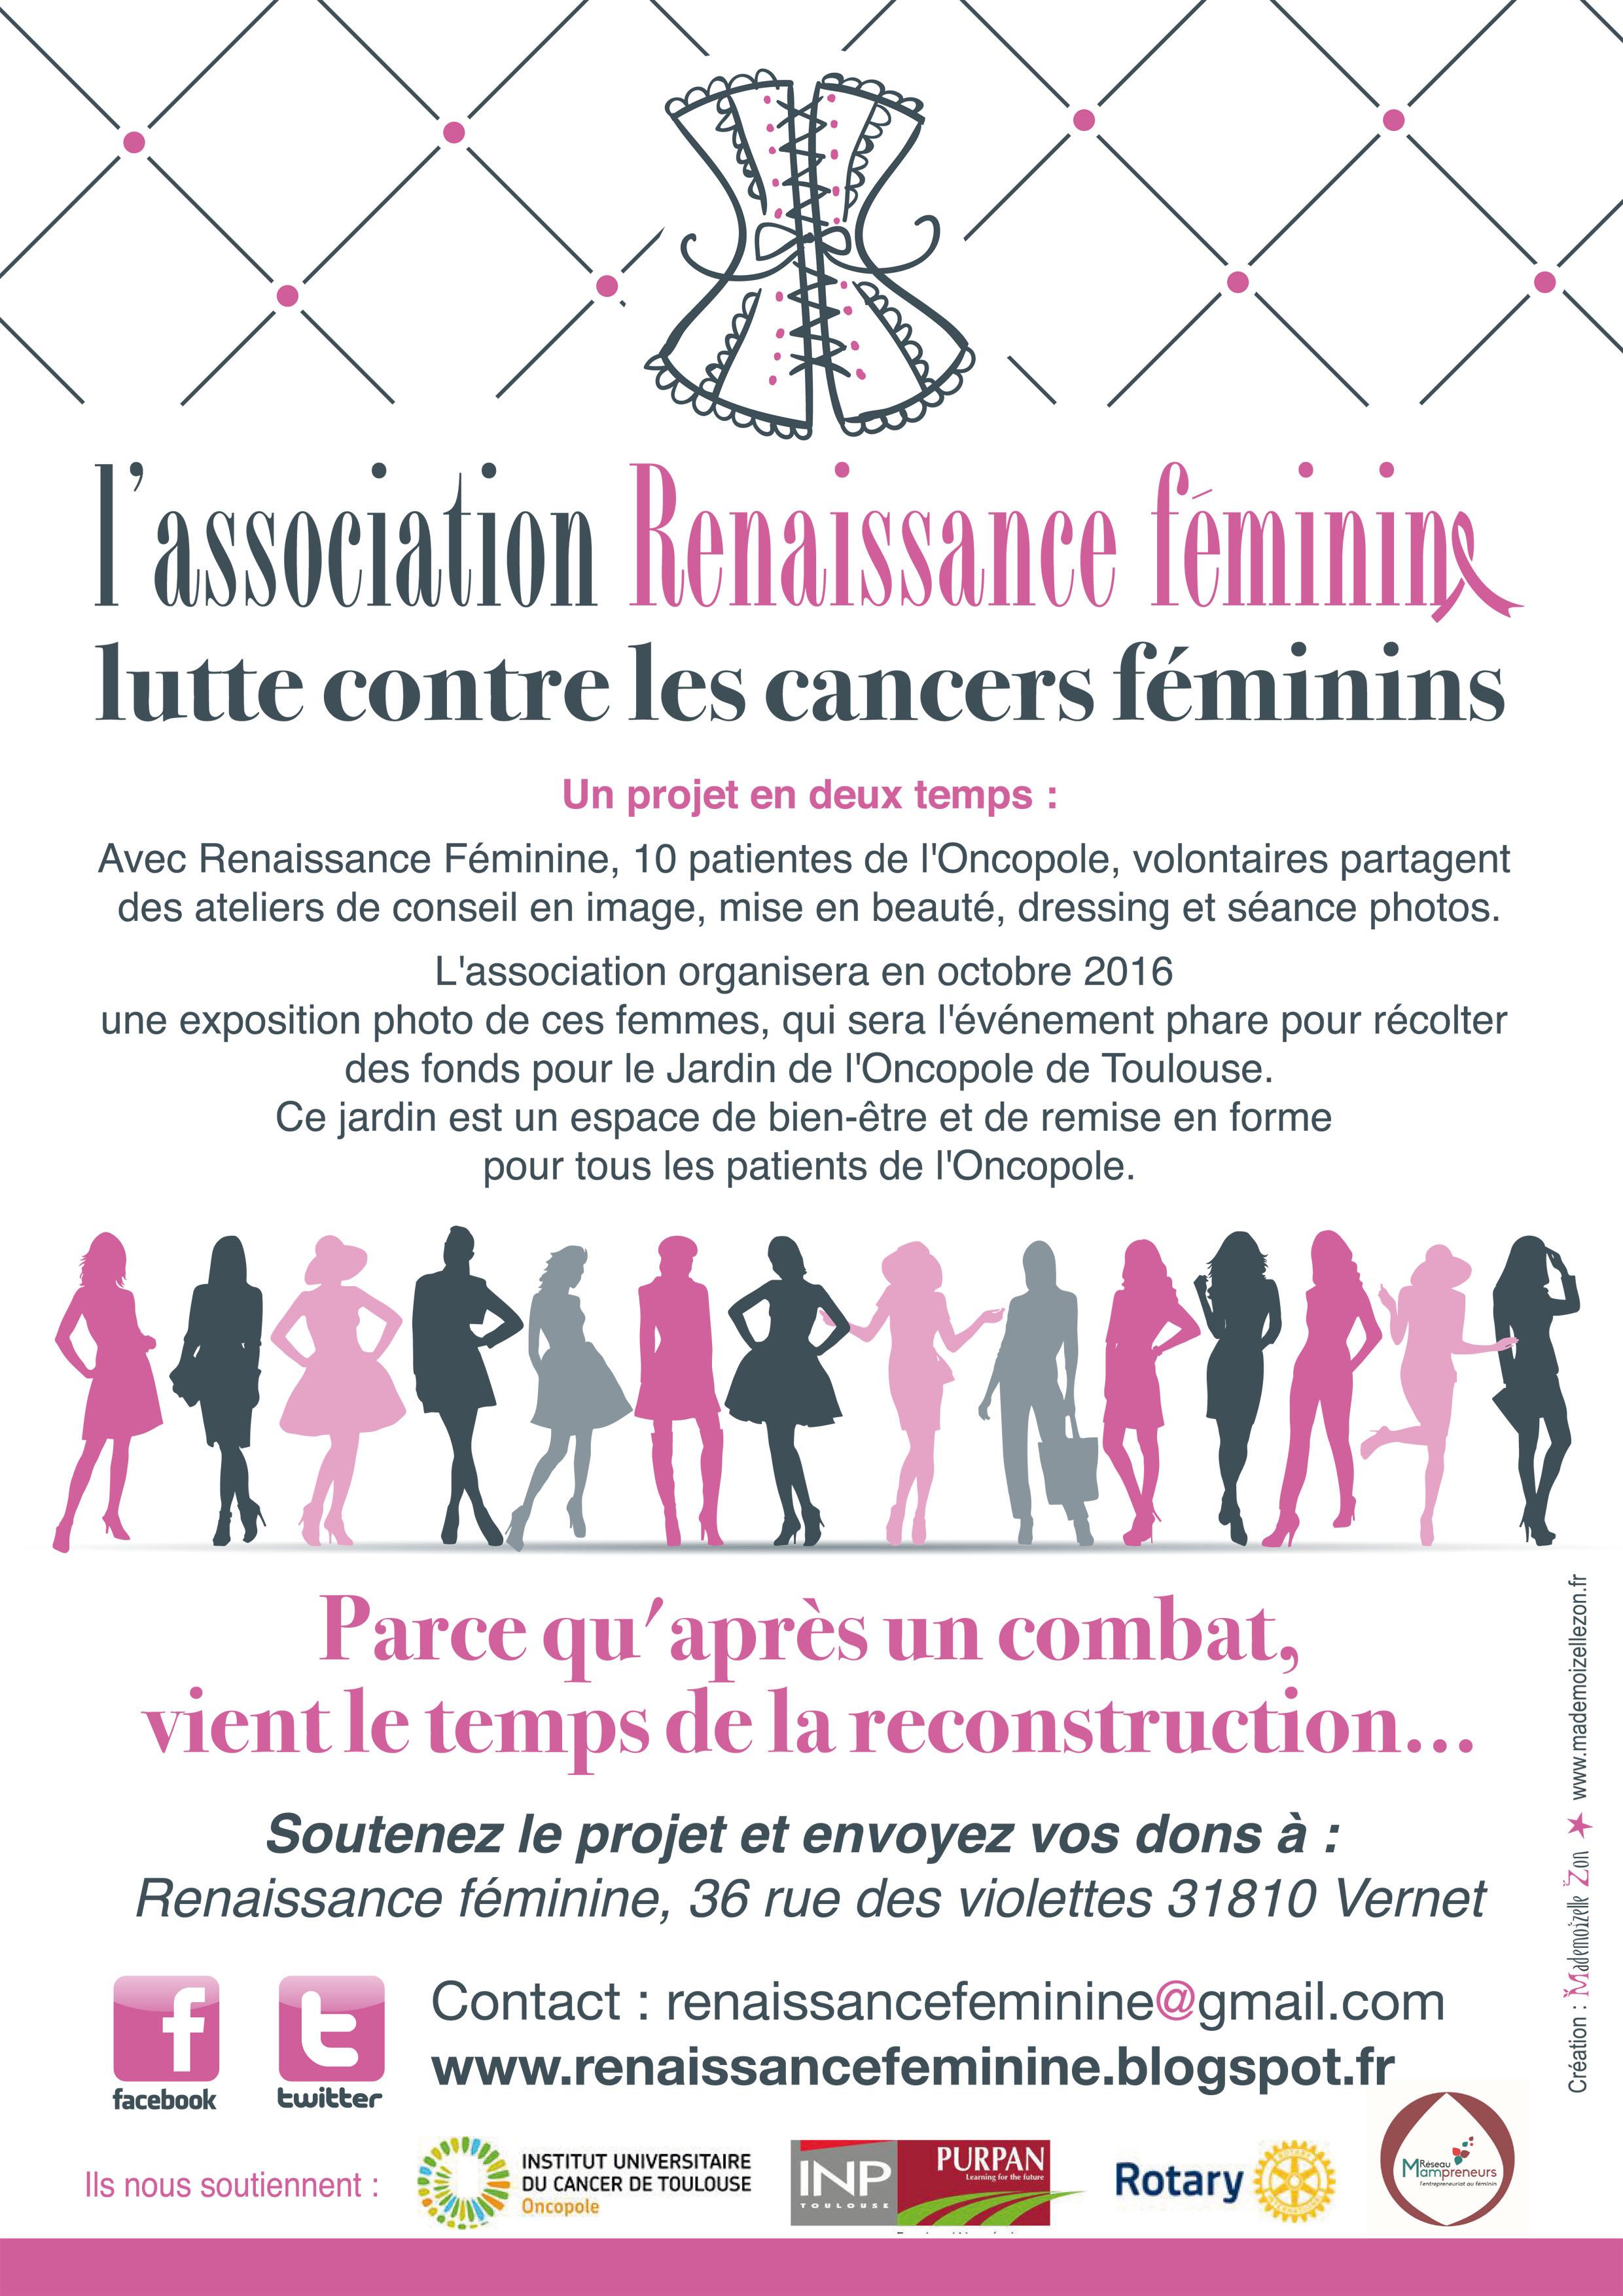 relooking femmes cancer besoin de dons